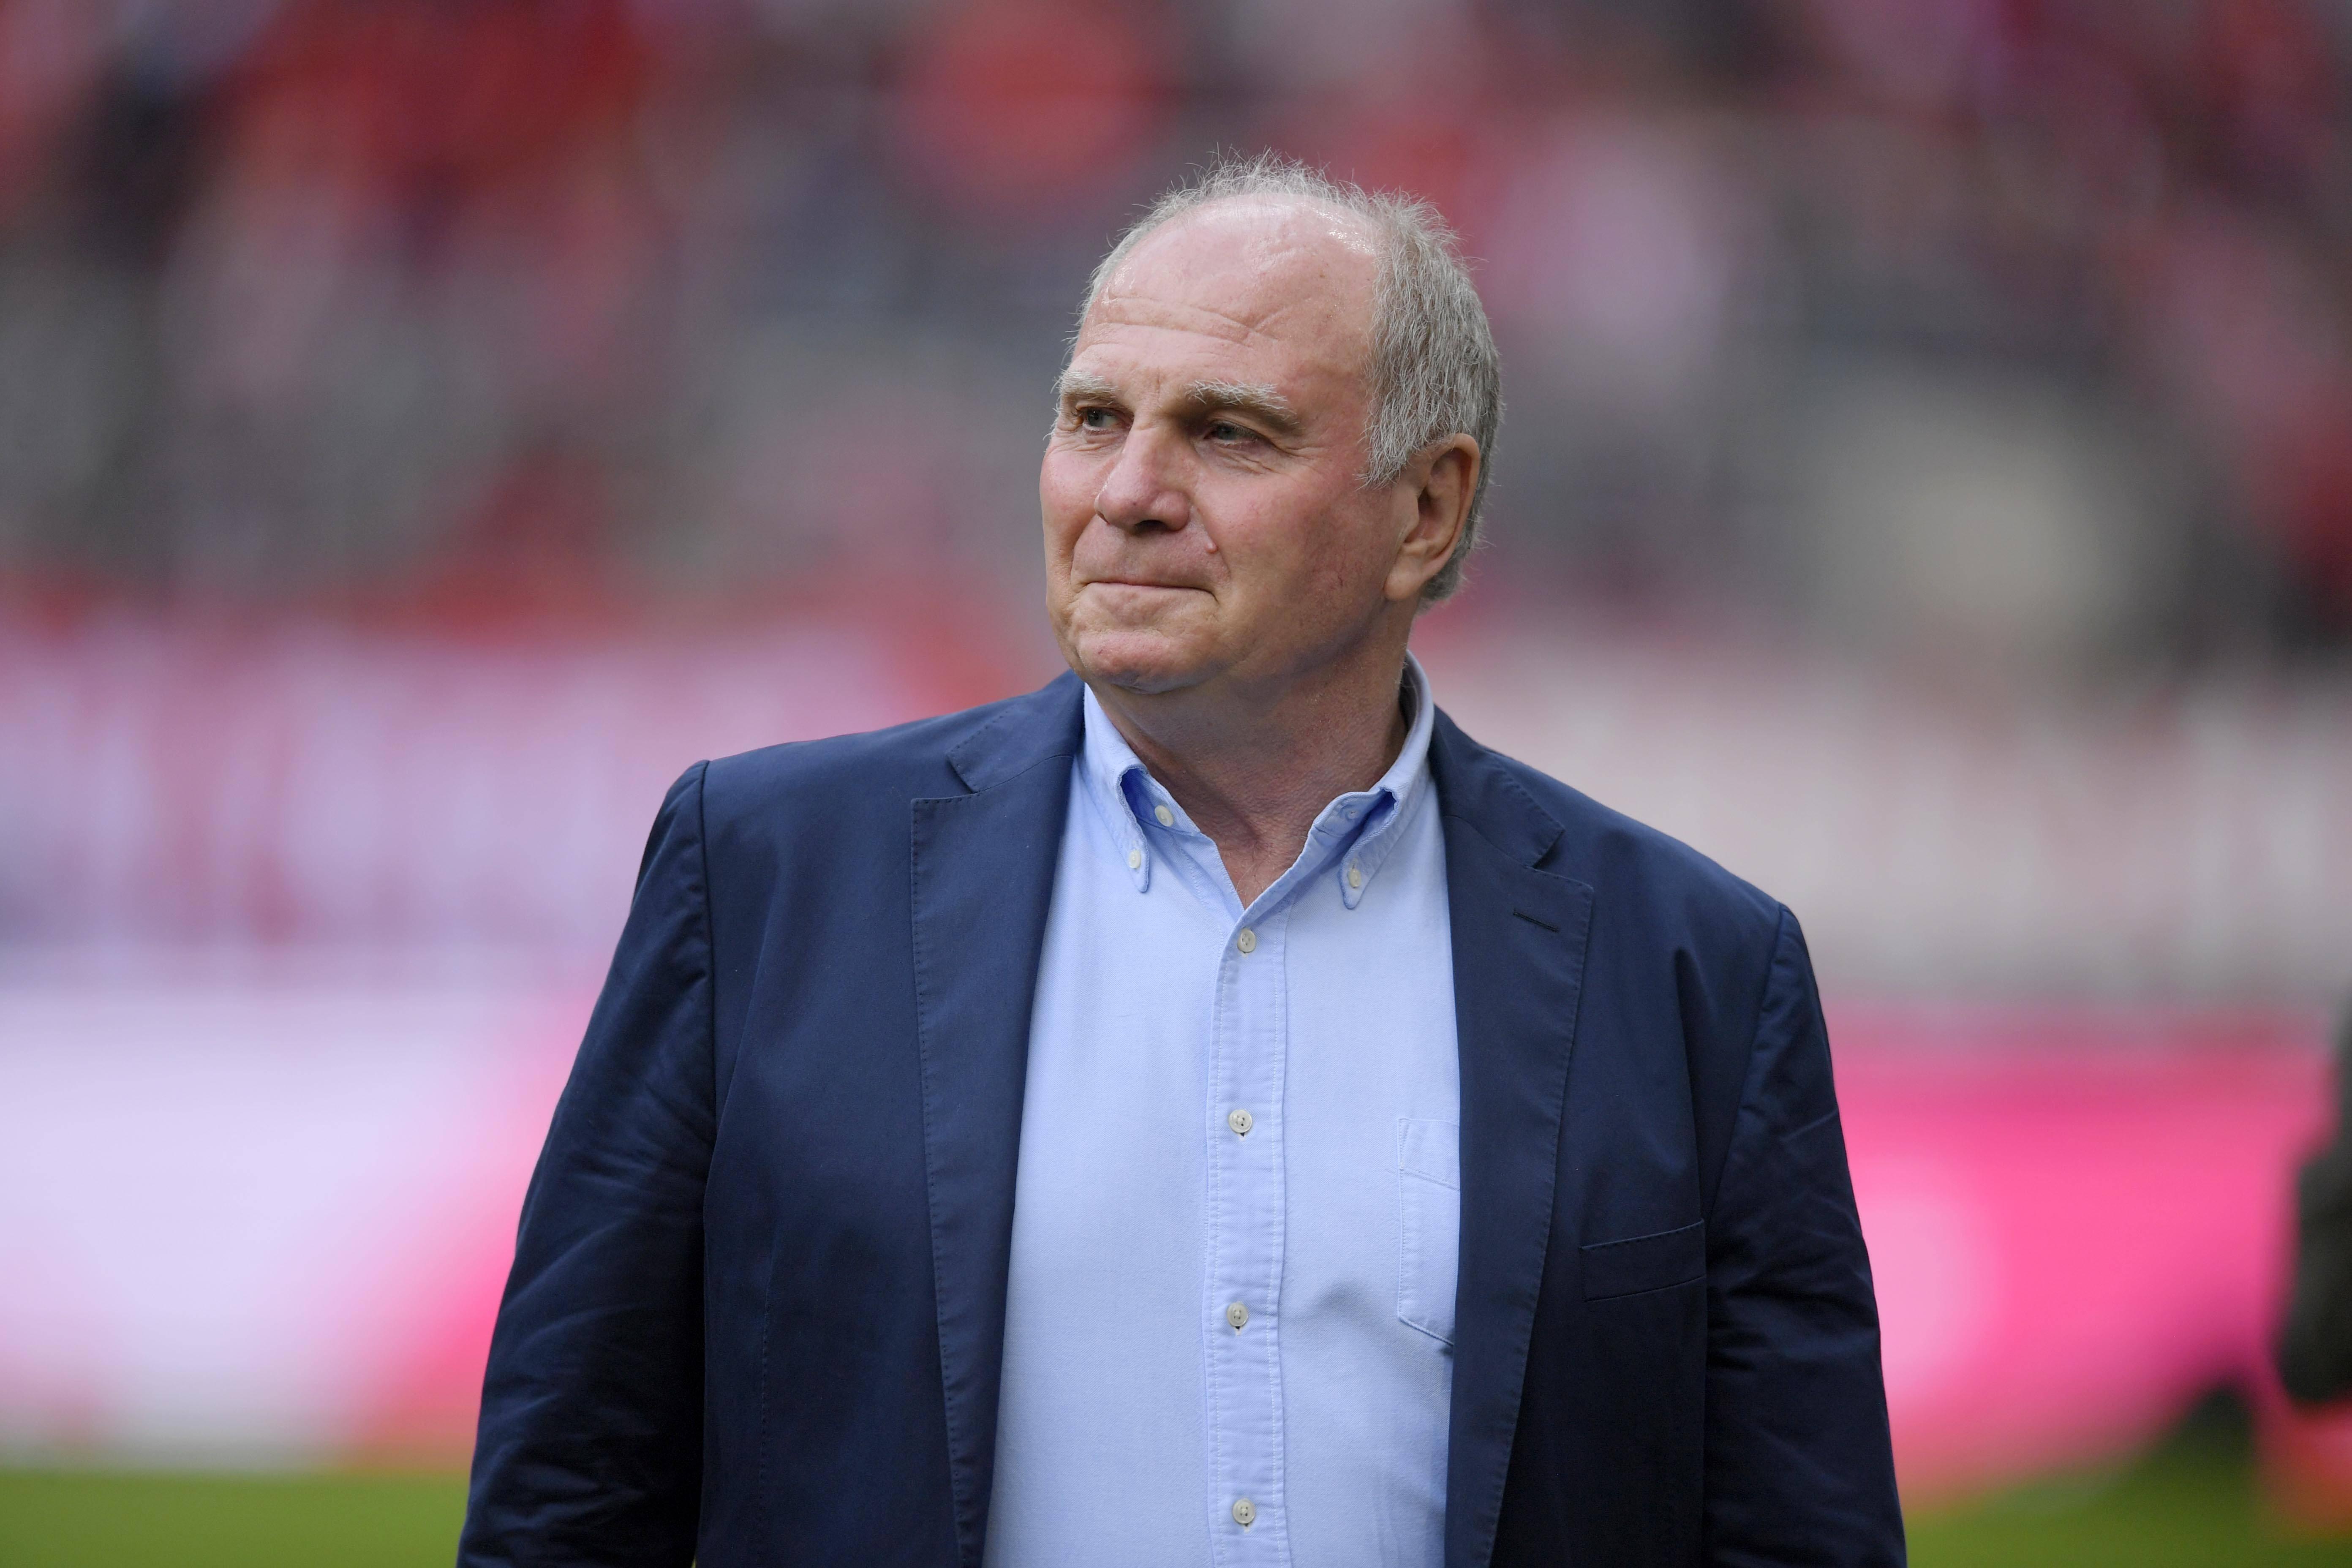 Football - Etranger - Bayern Munich : les dates clés du « règne » d'Hoeness